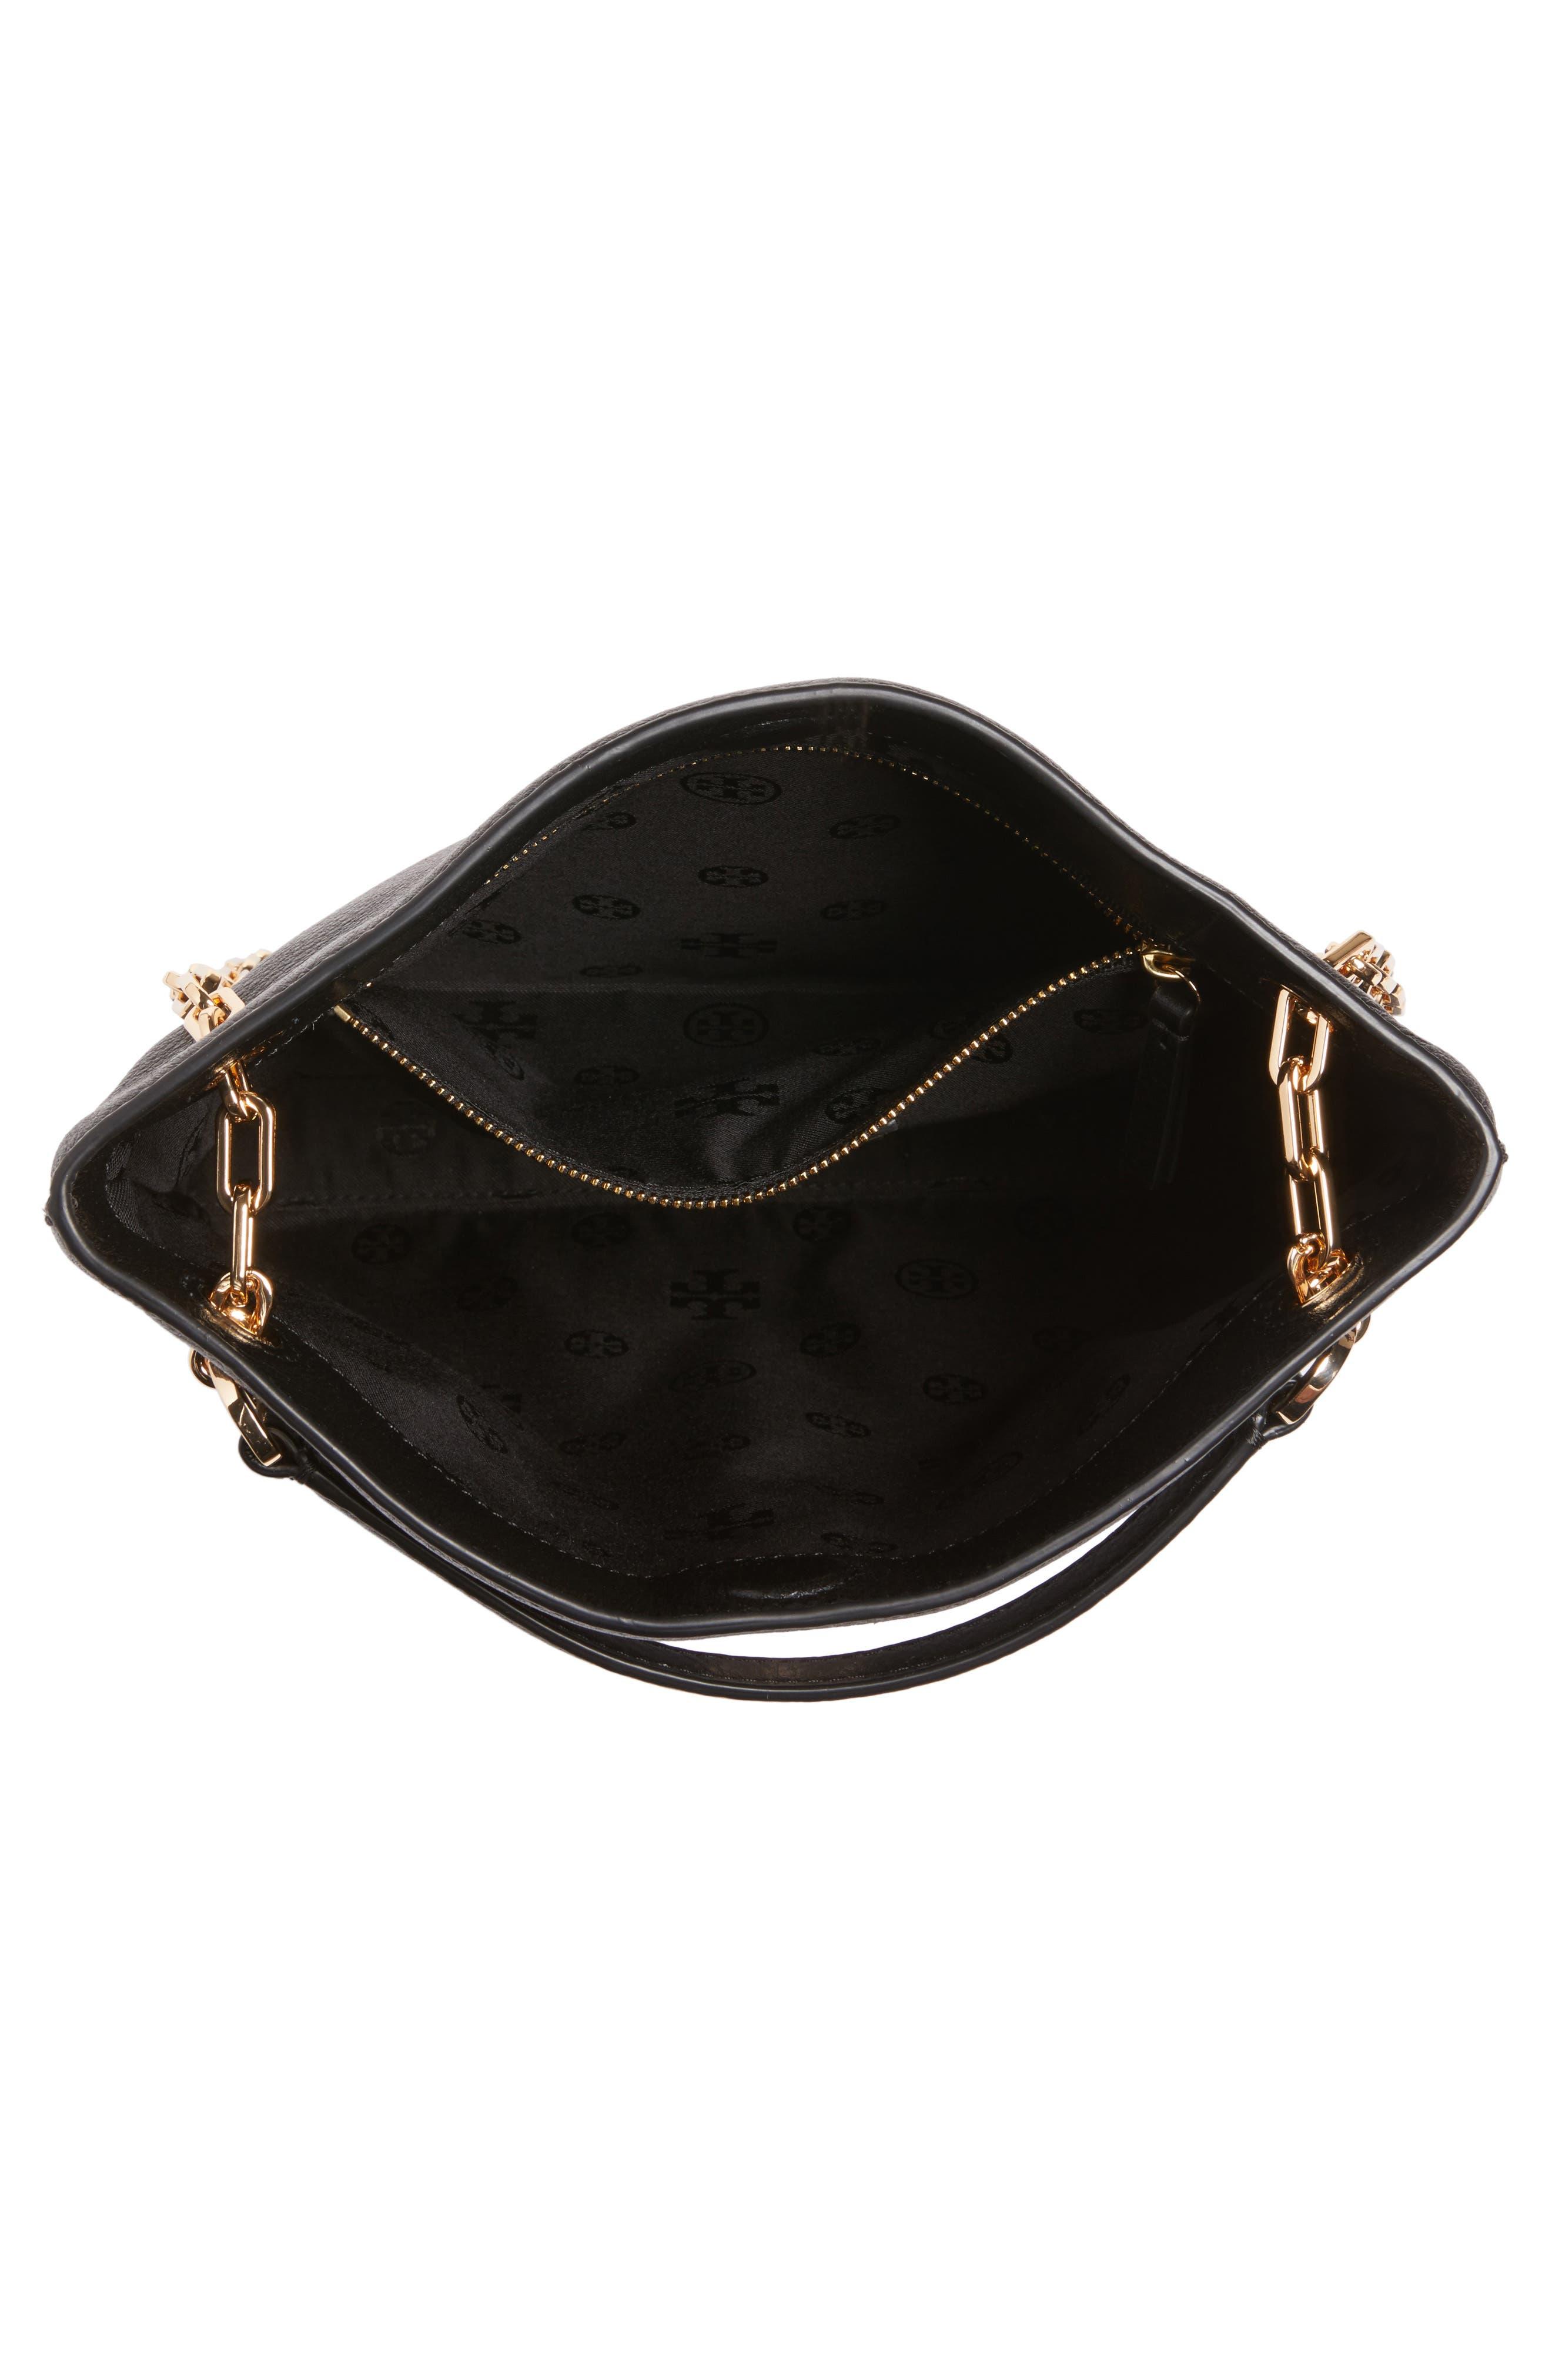 Frida Swingpack Leather Crossbody Bag,                             Alternate thumbnail 4, color,                             001